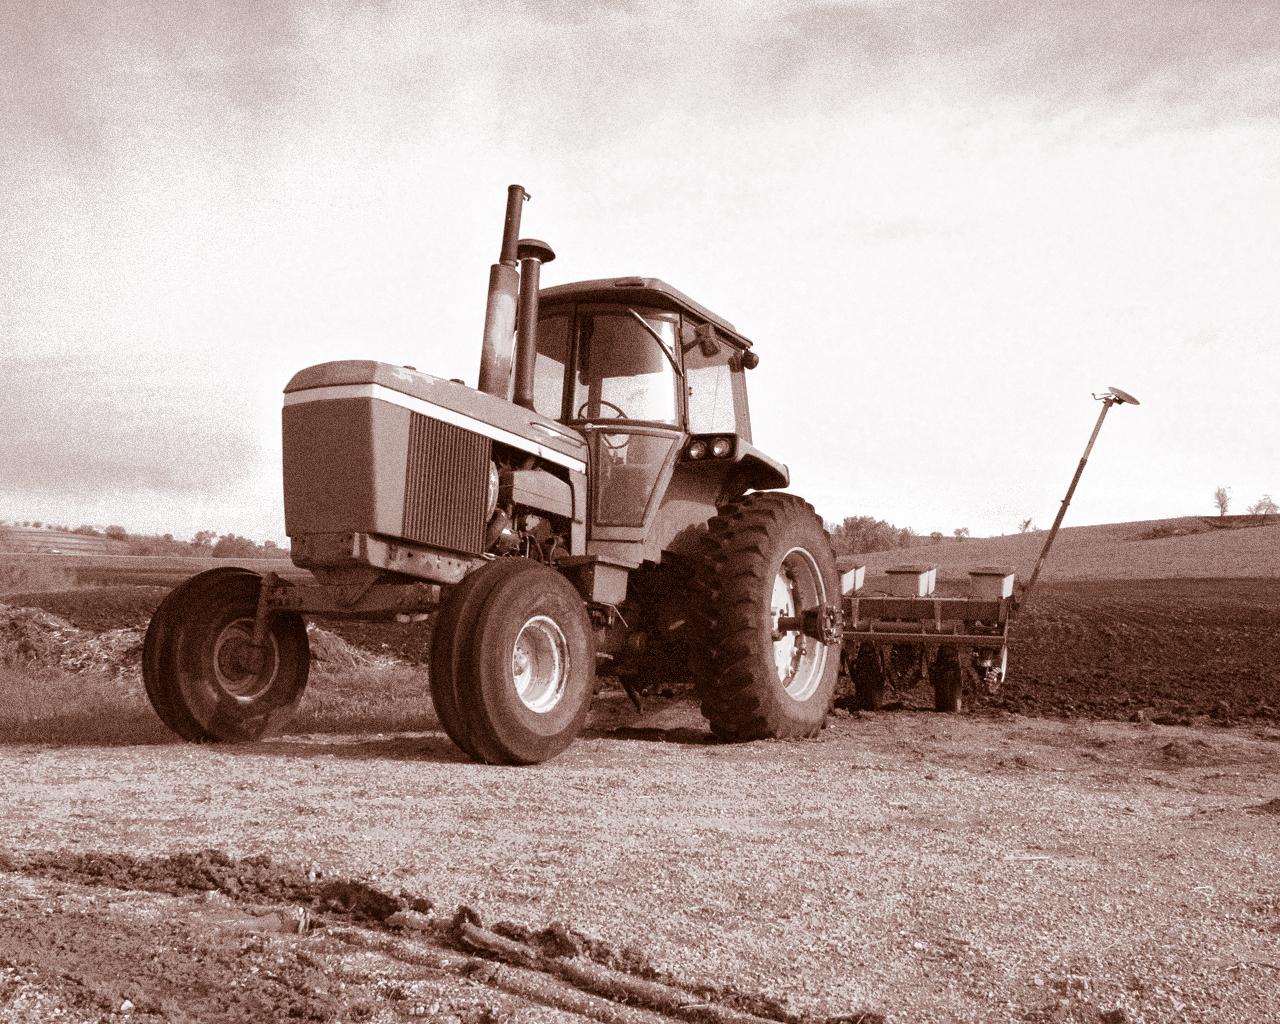 File:John Deere 4630 tractor.jpg - Wikimedia Commons